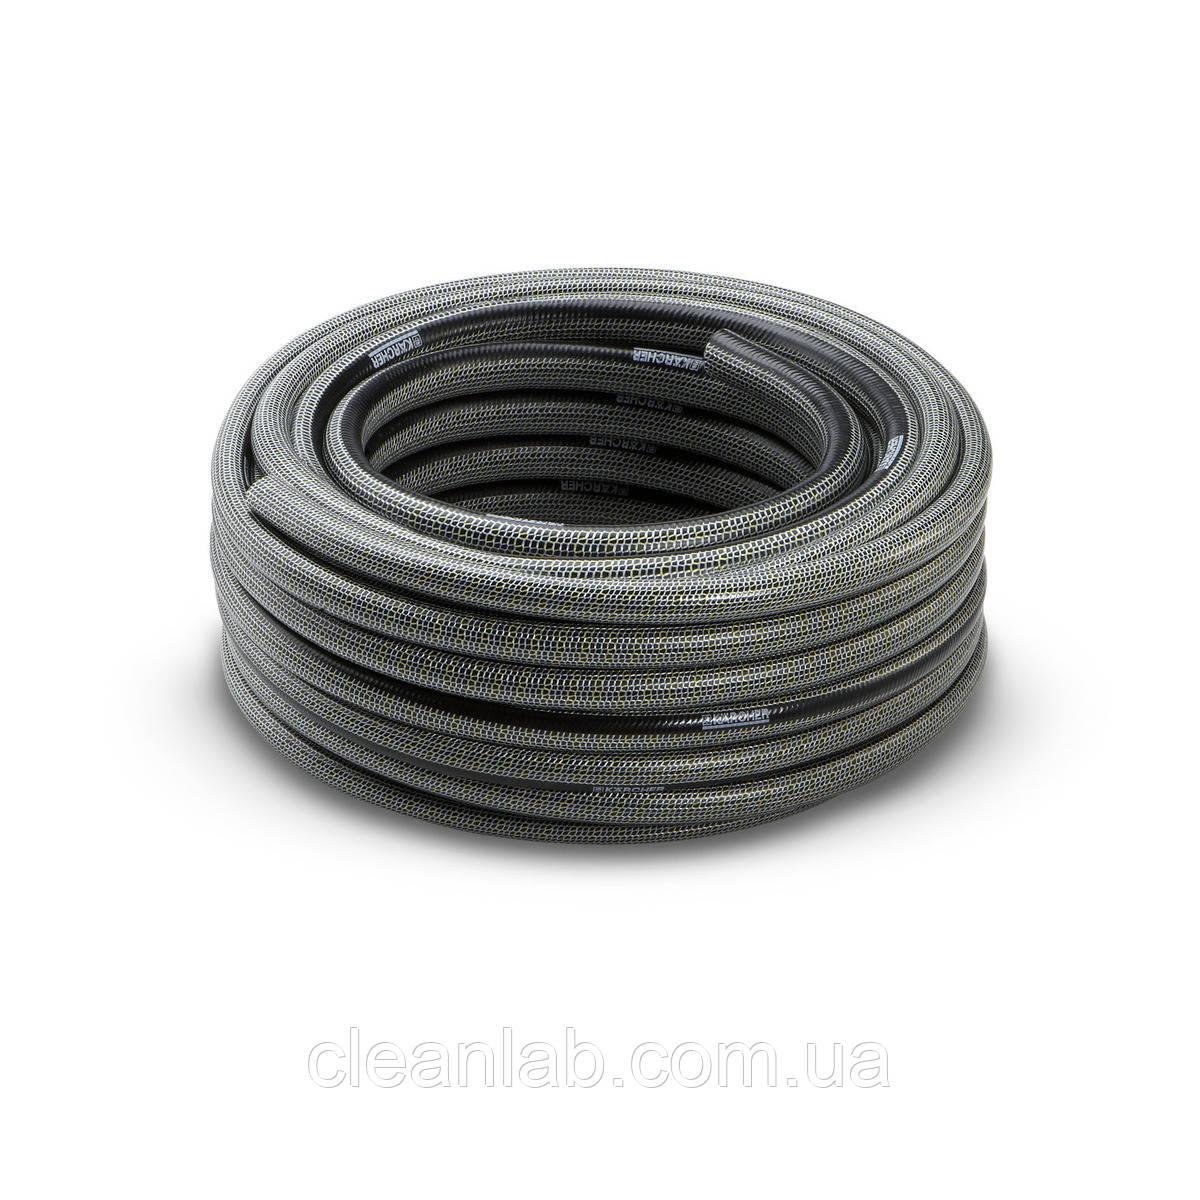 Шланг Karcher  Primo FlexPremium 5-ти слойный 1/2 - 20М